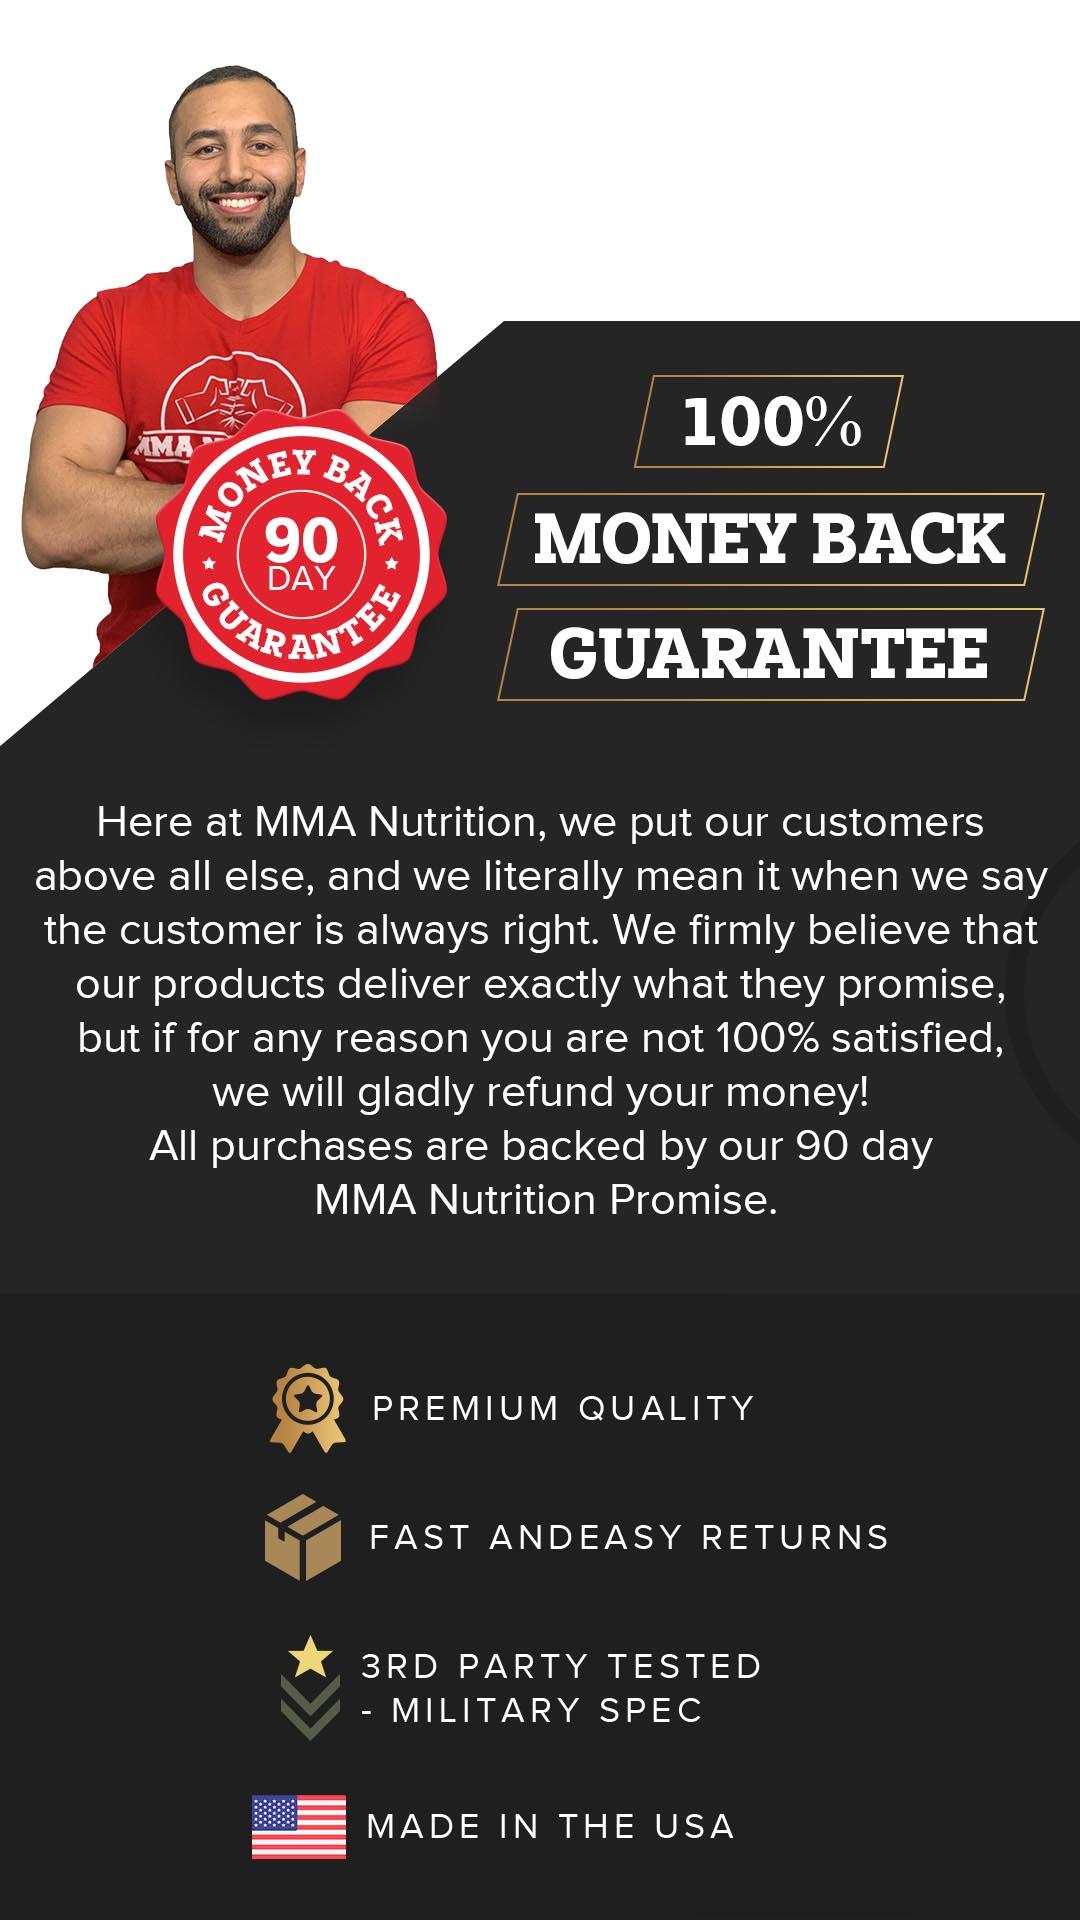 MMA NUTRITION - 90 Day Money Back Guarantee.jpg